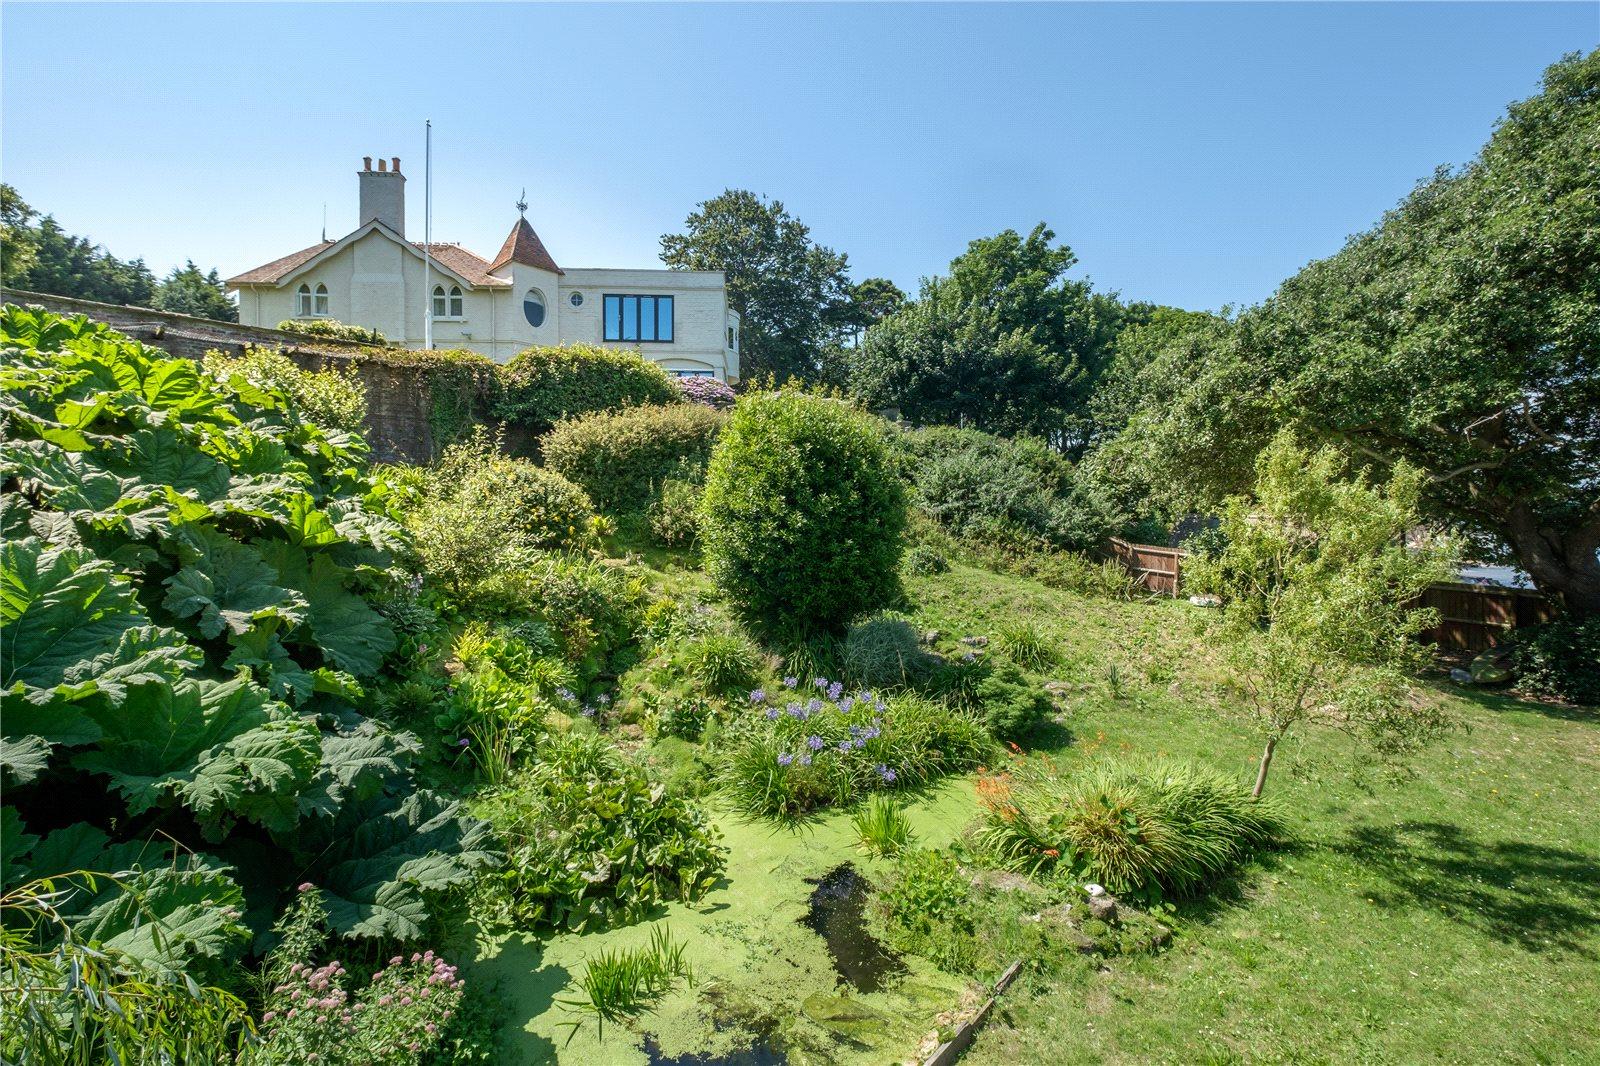 Additional photo for property listing at Swains Road, Bembridge, Isle of Wight, PO35 Bembridge, England